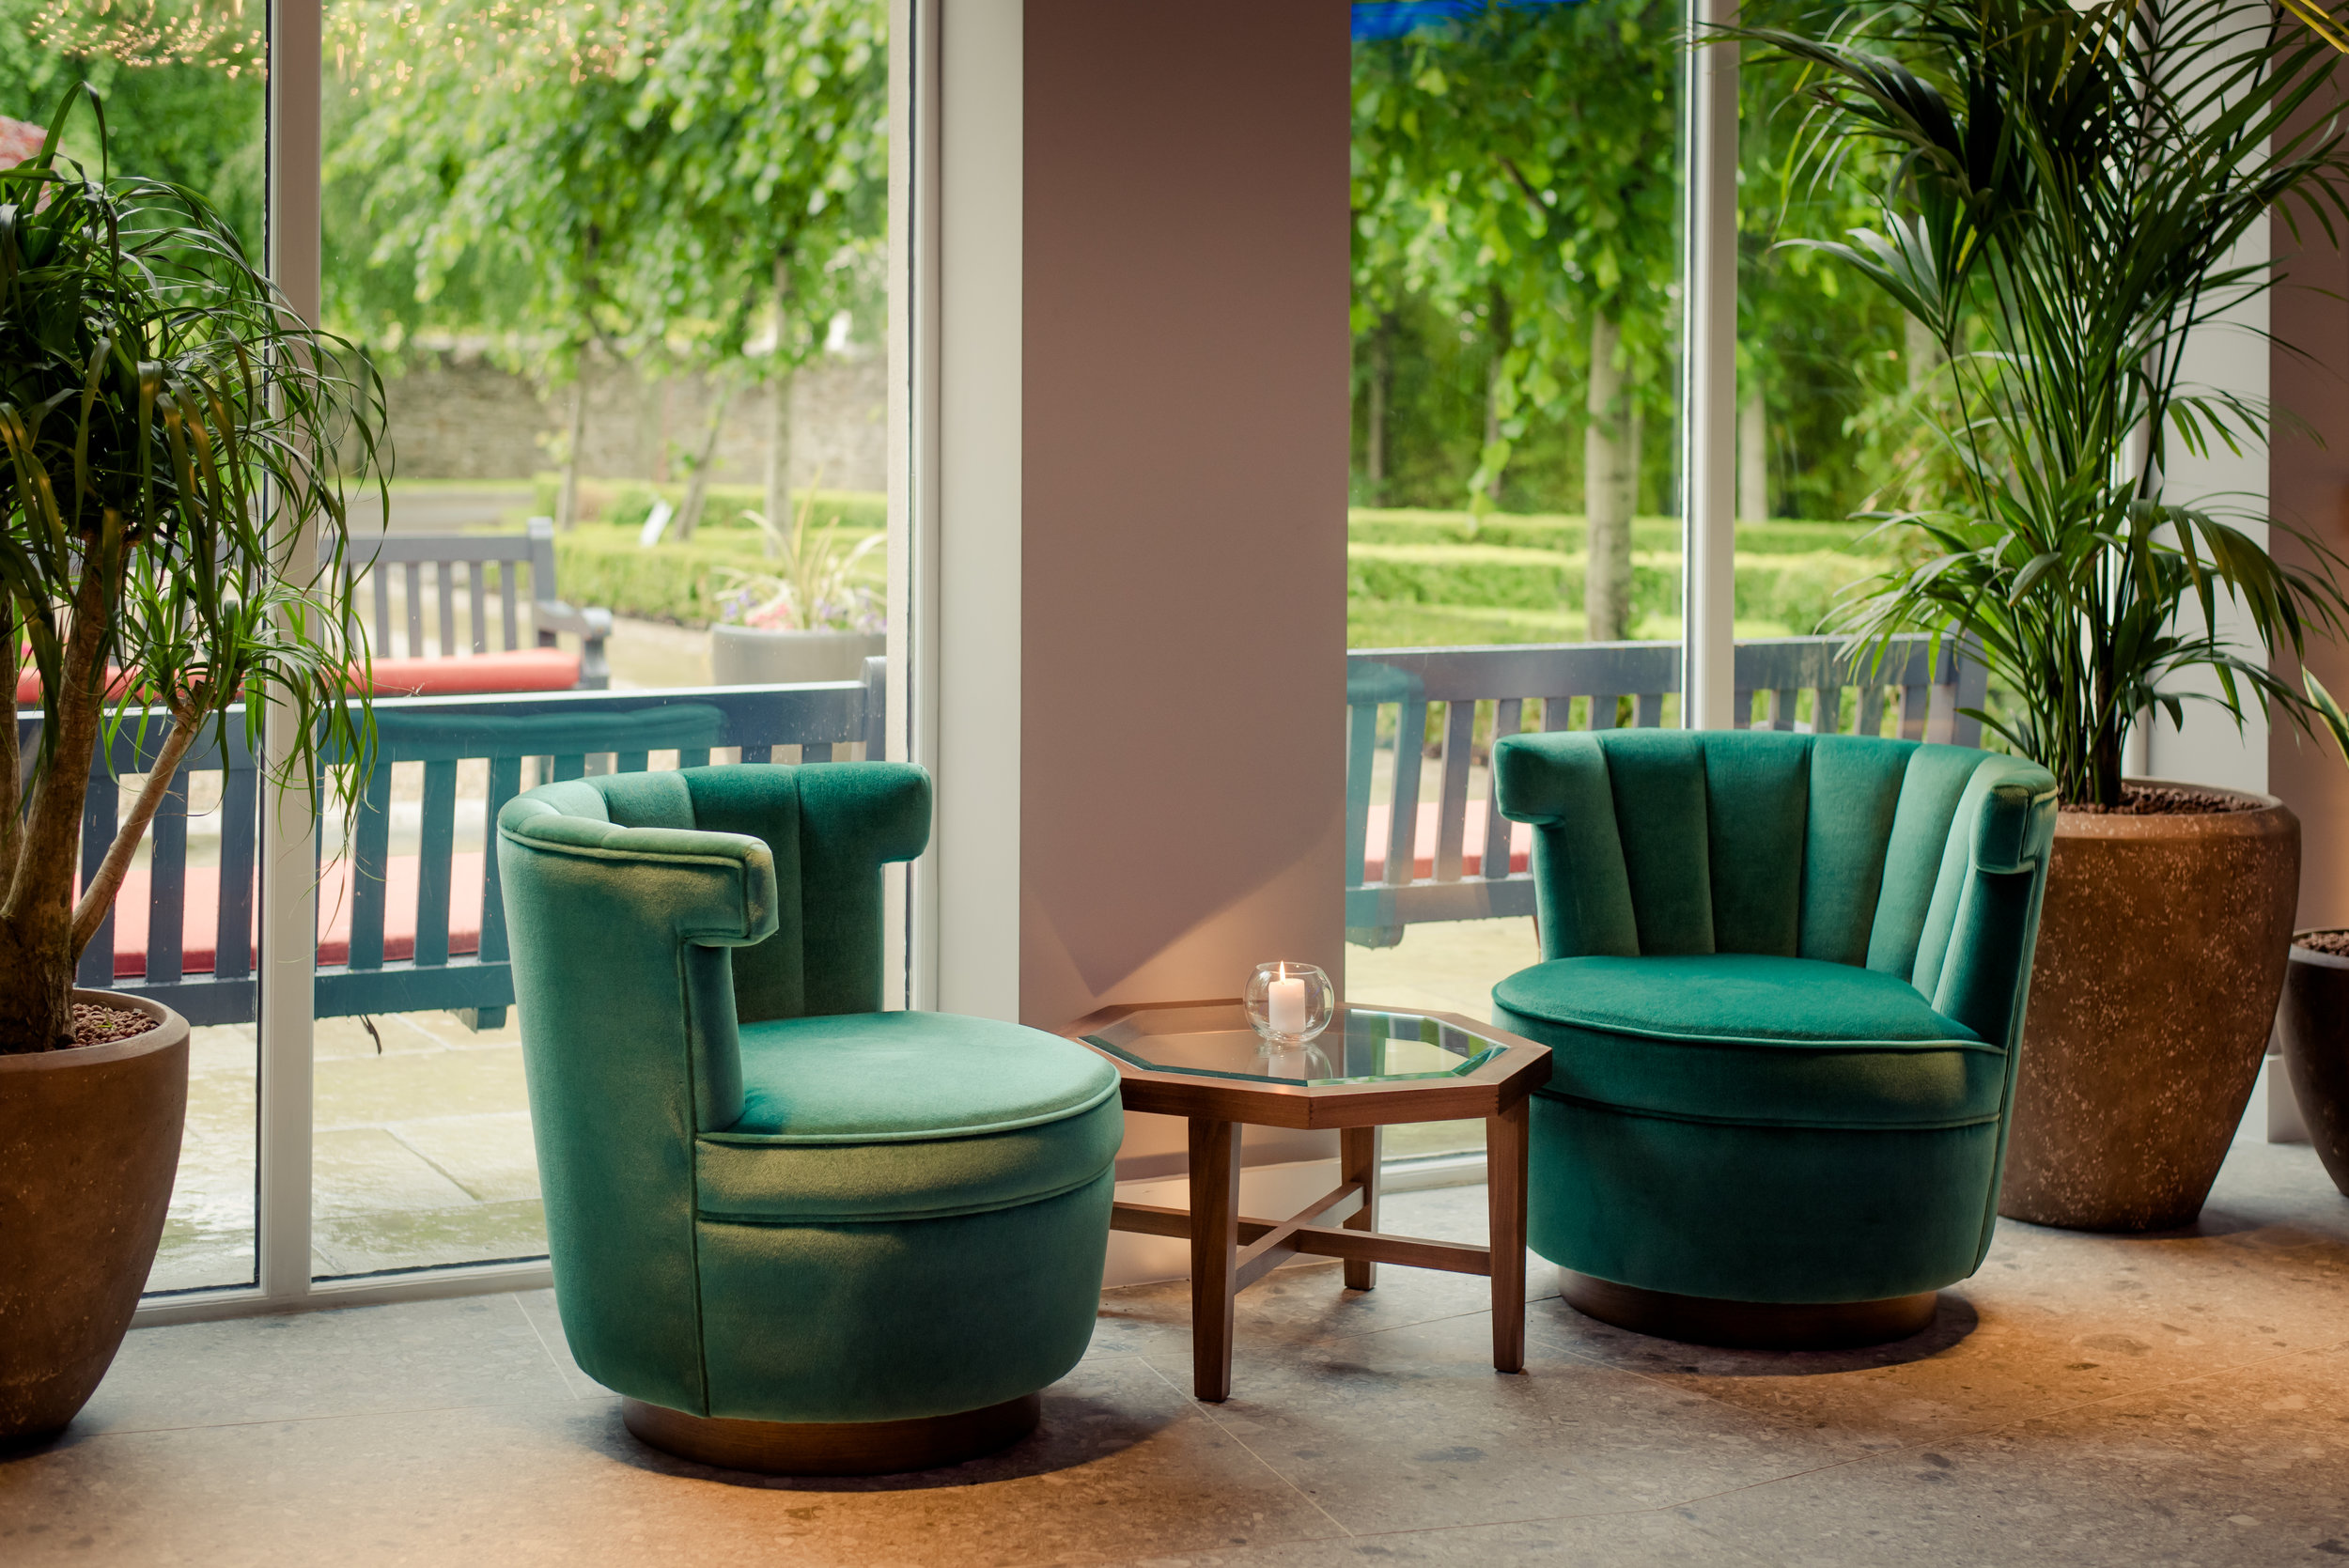 Tulfarris Hotel & Golf Resort lobby seating by the entrance.jpg